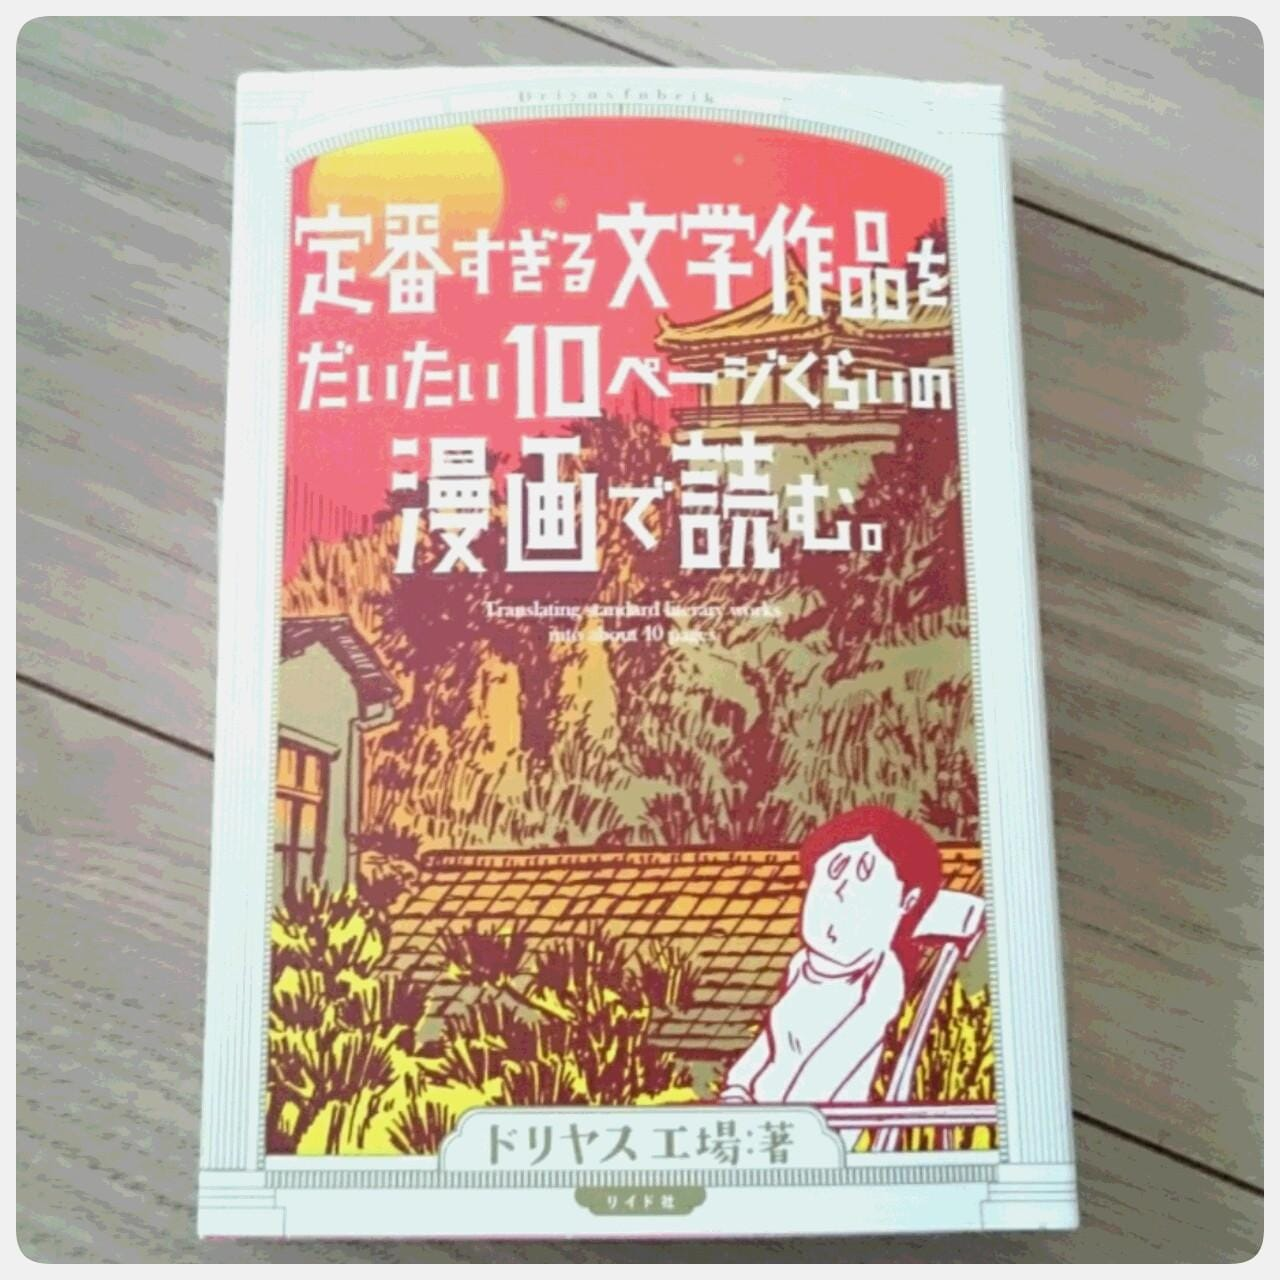 「just right」02/16(02/16) 16:04 | 星野 夢果の写メ・風俗動画